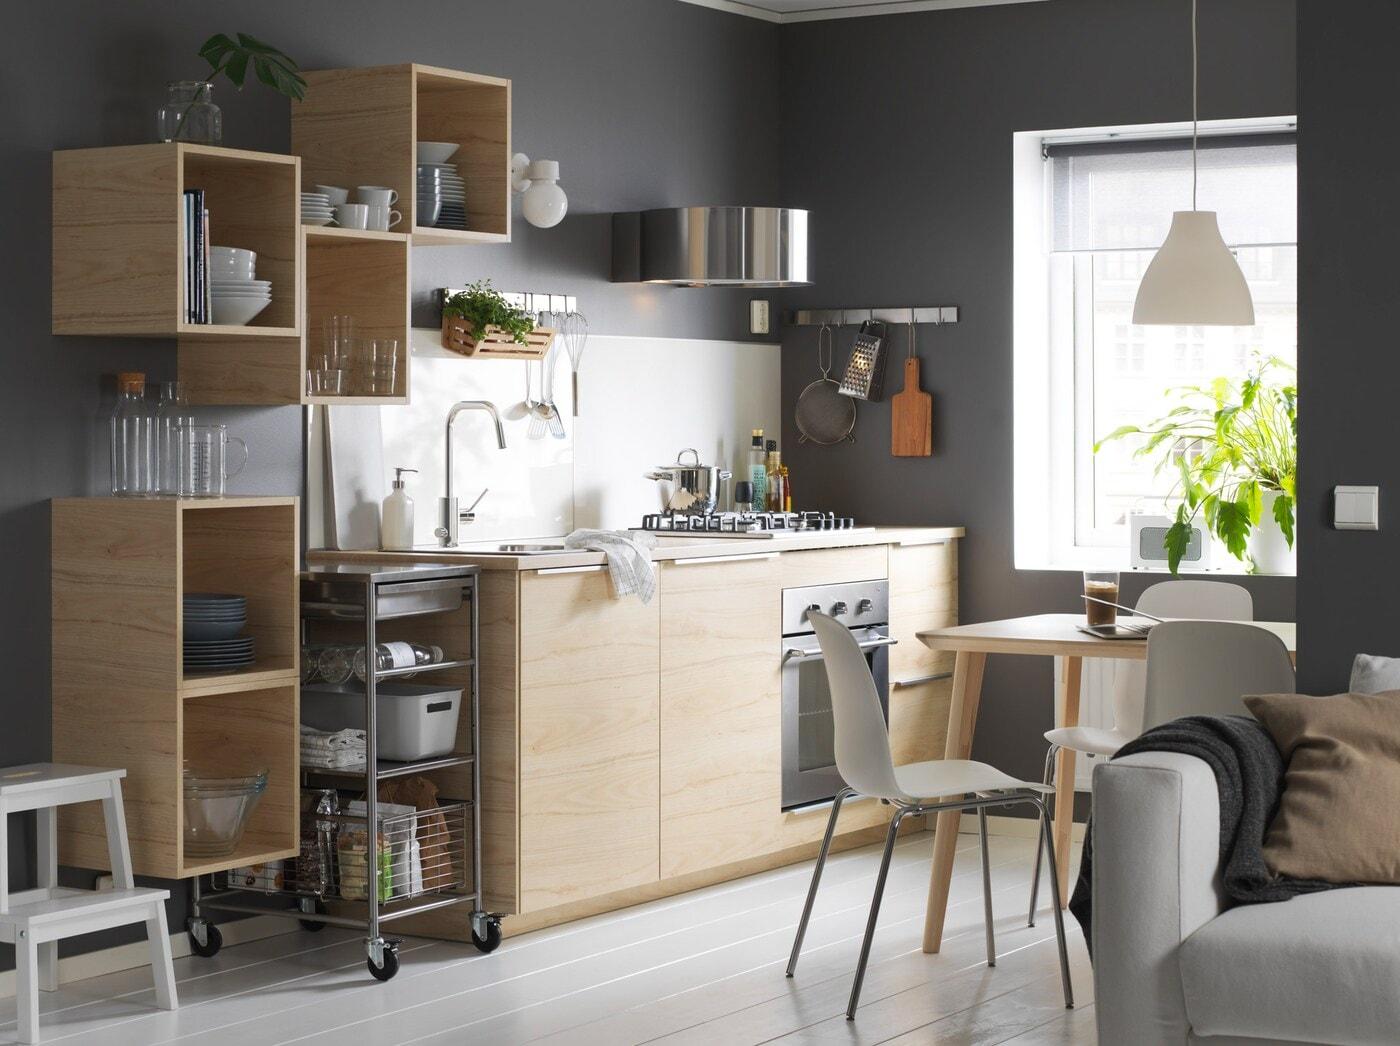 Дизайн кухни из мебели икеа фото